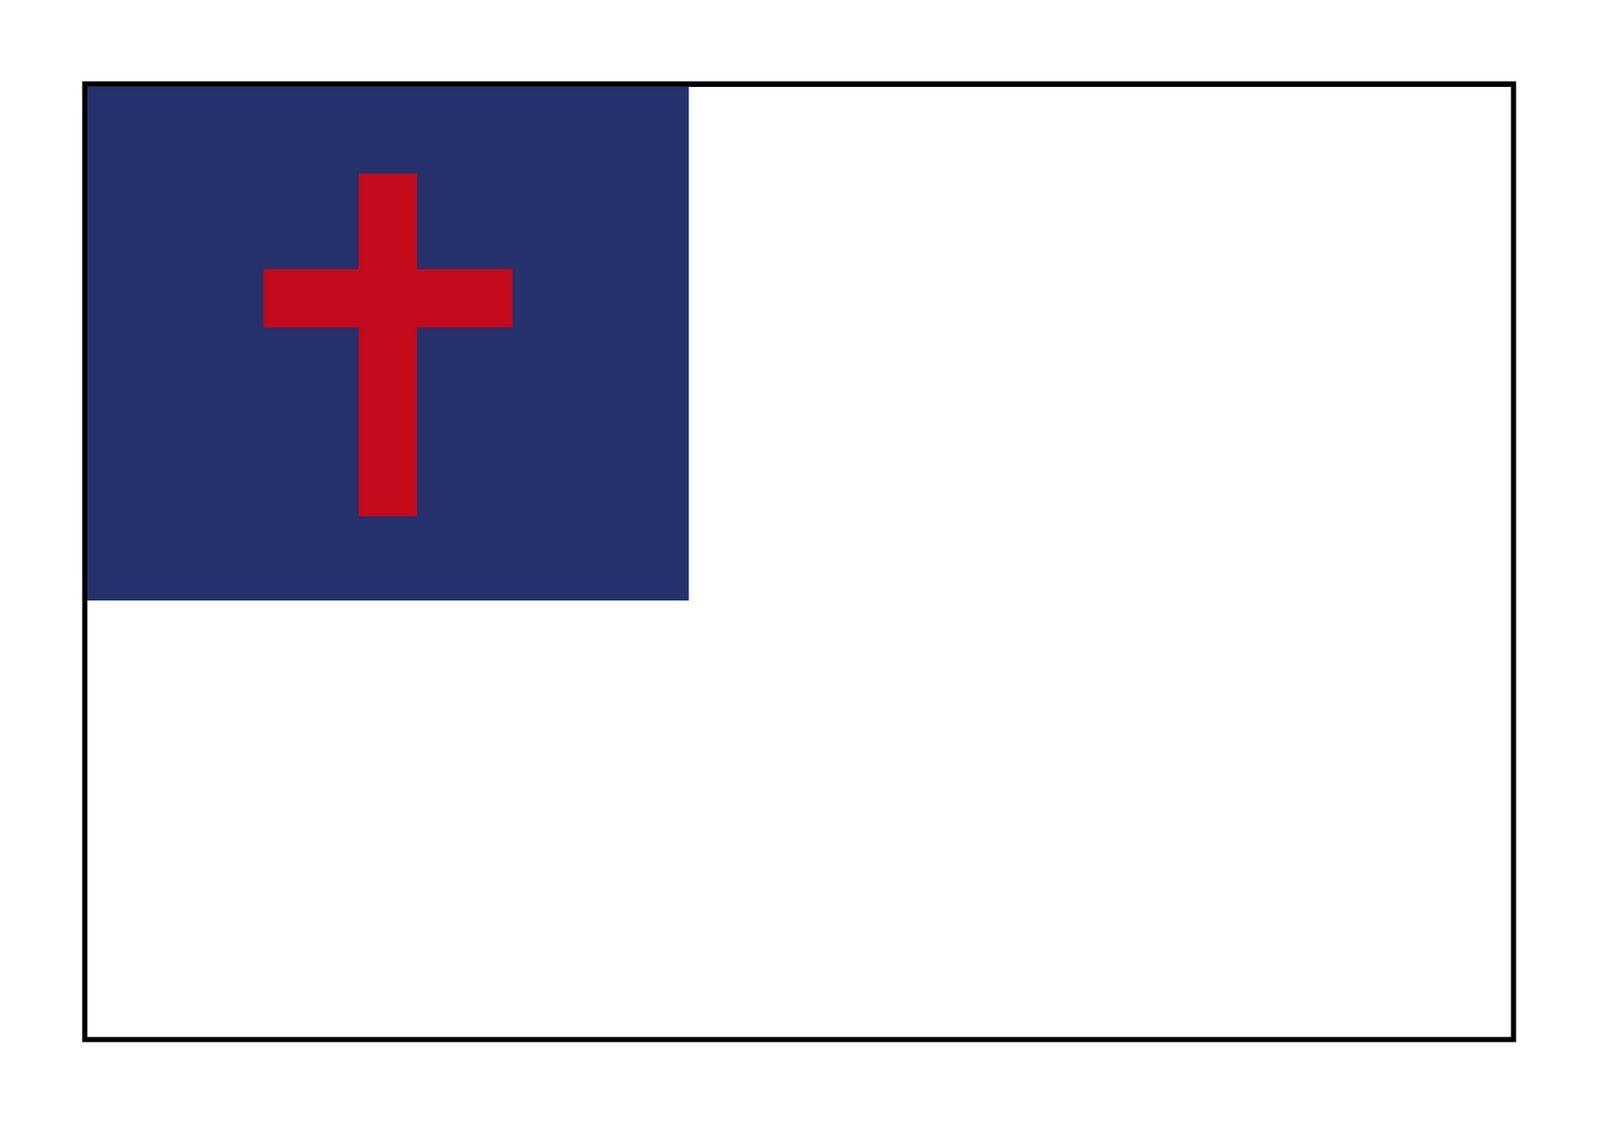 Christian Flag Clip Art Christian Flag Pledge To The Christian Flag Christian Images